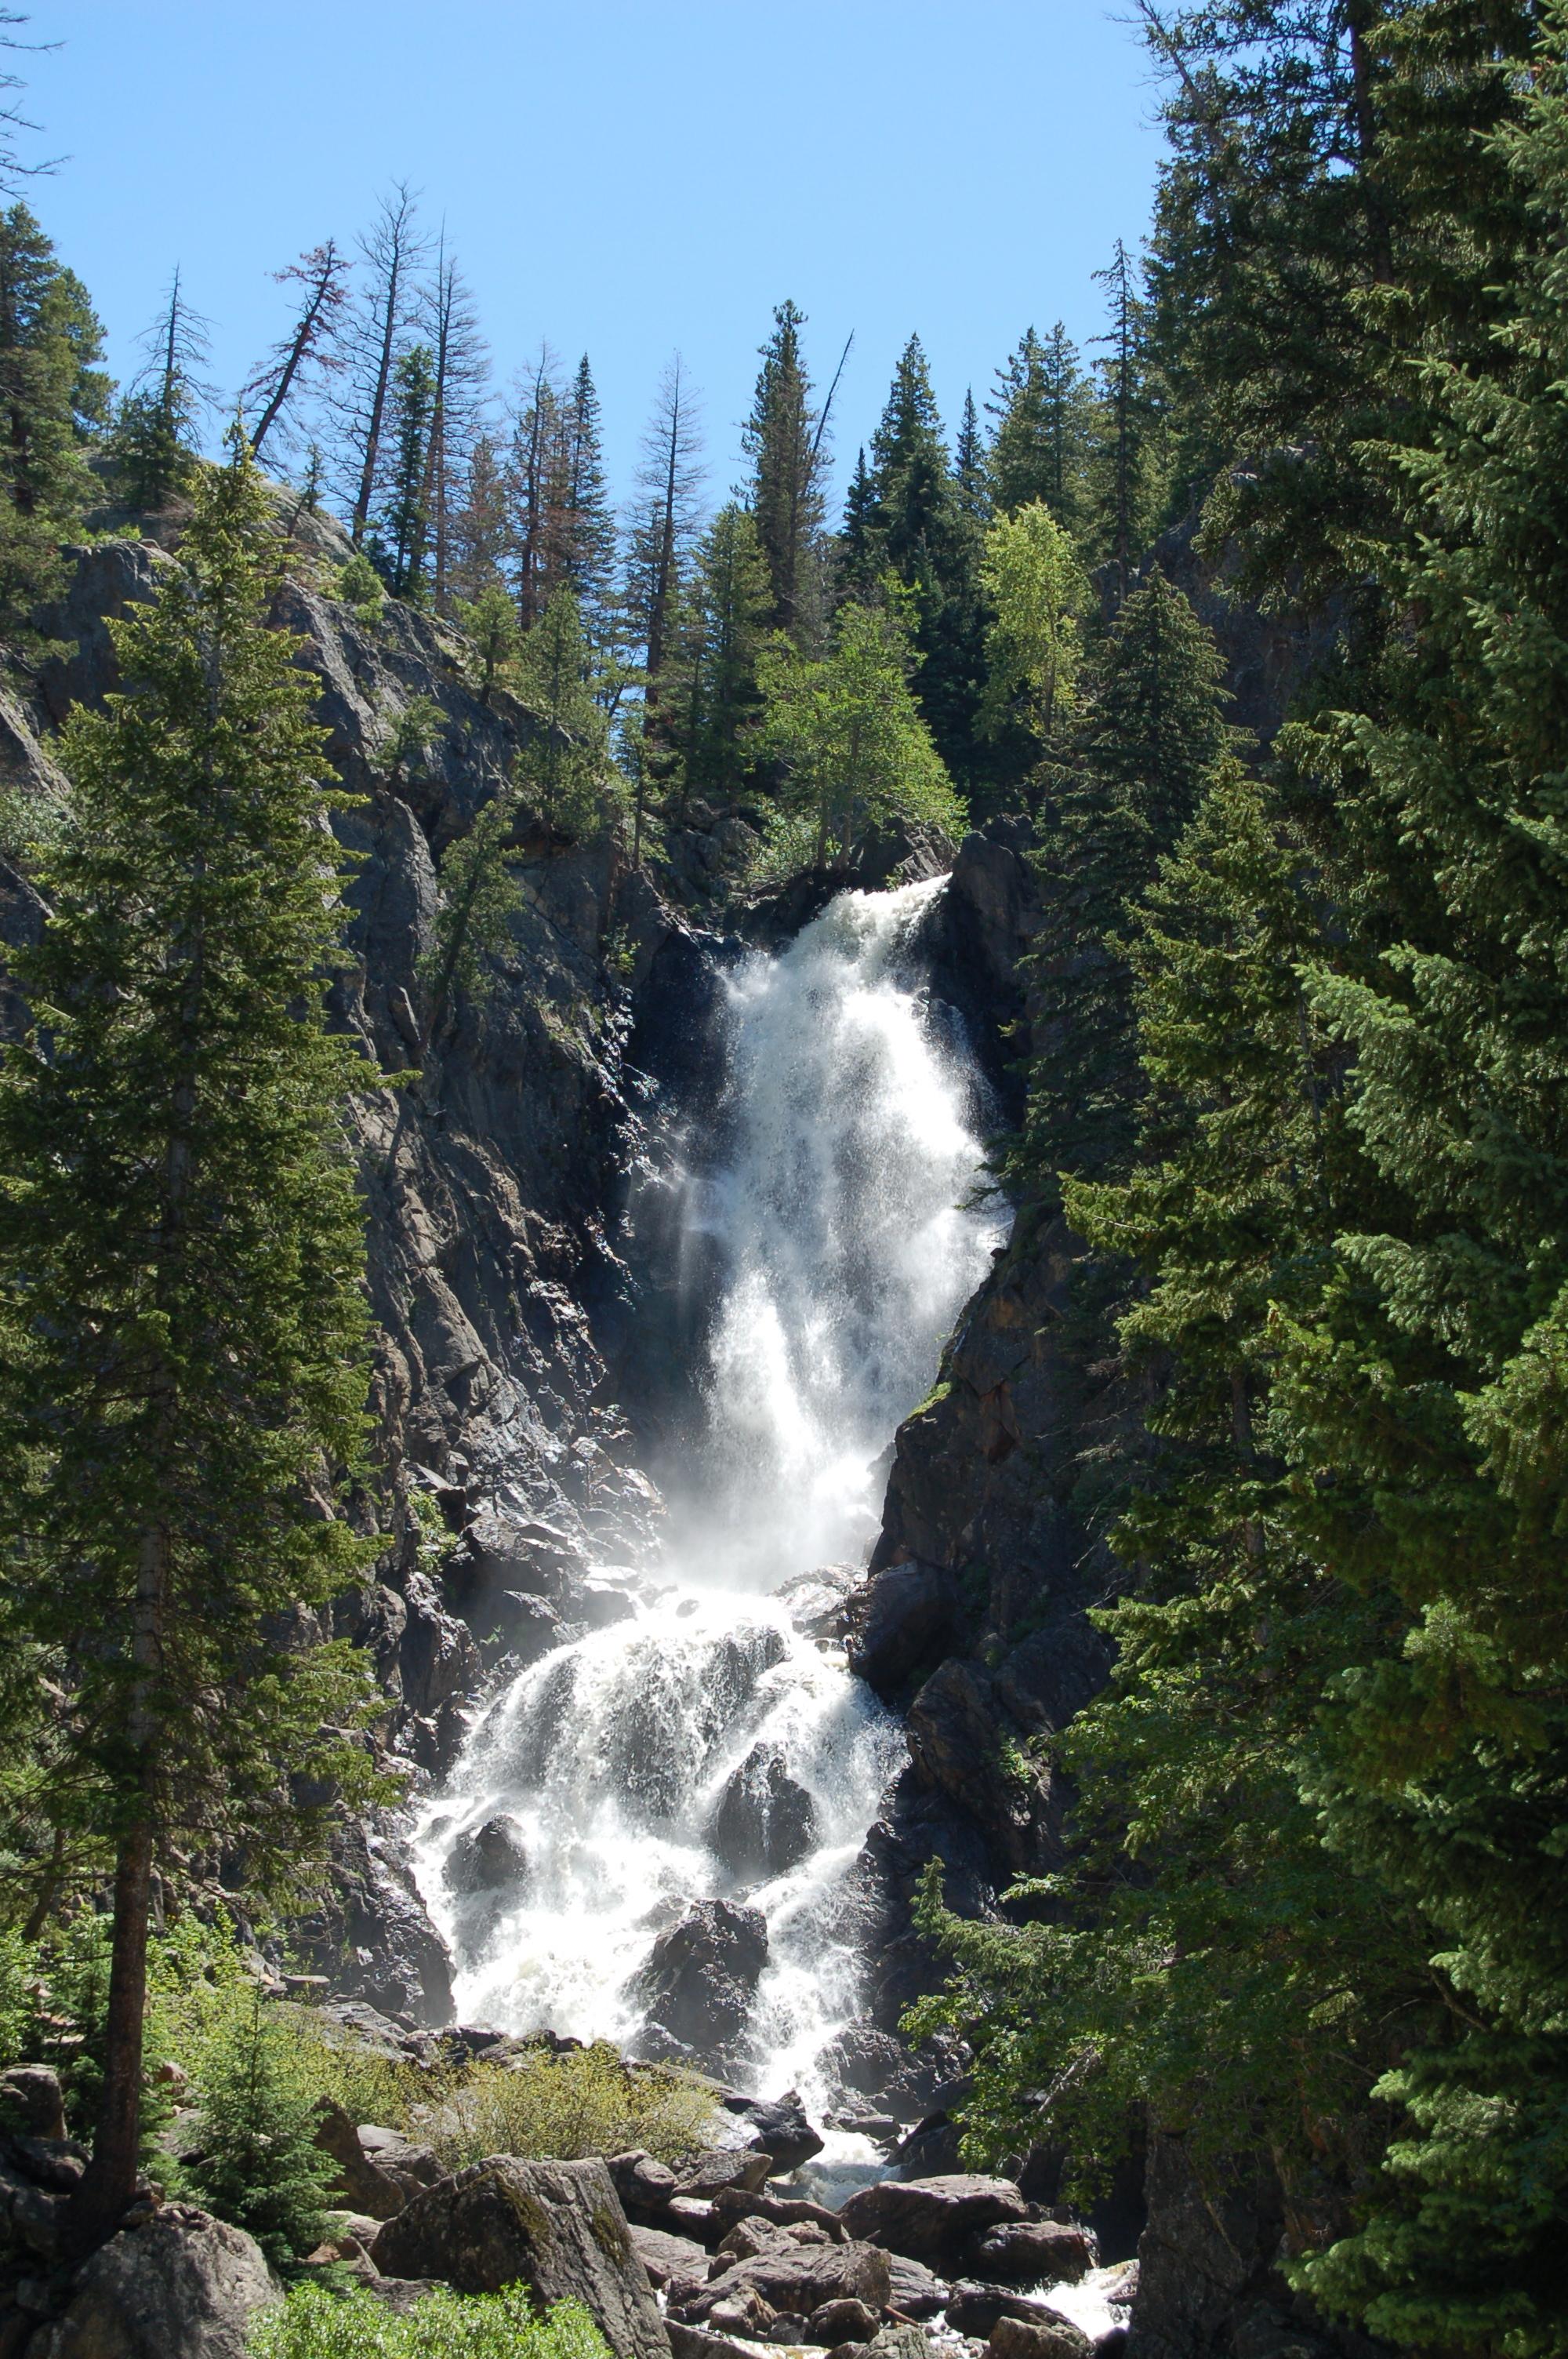 Falls Wallpaper Waterfall File Fish Creek Falls Colorado Jpg Wikimedia Commons